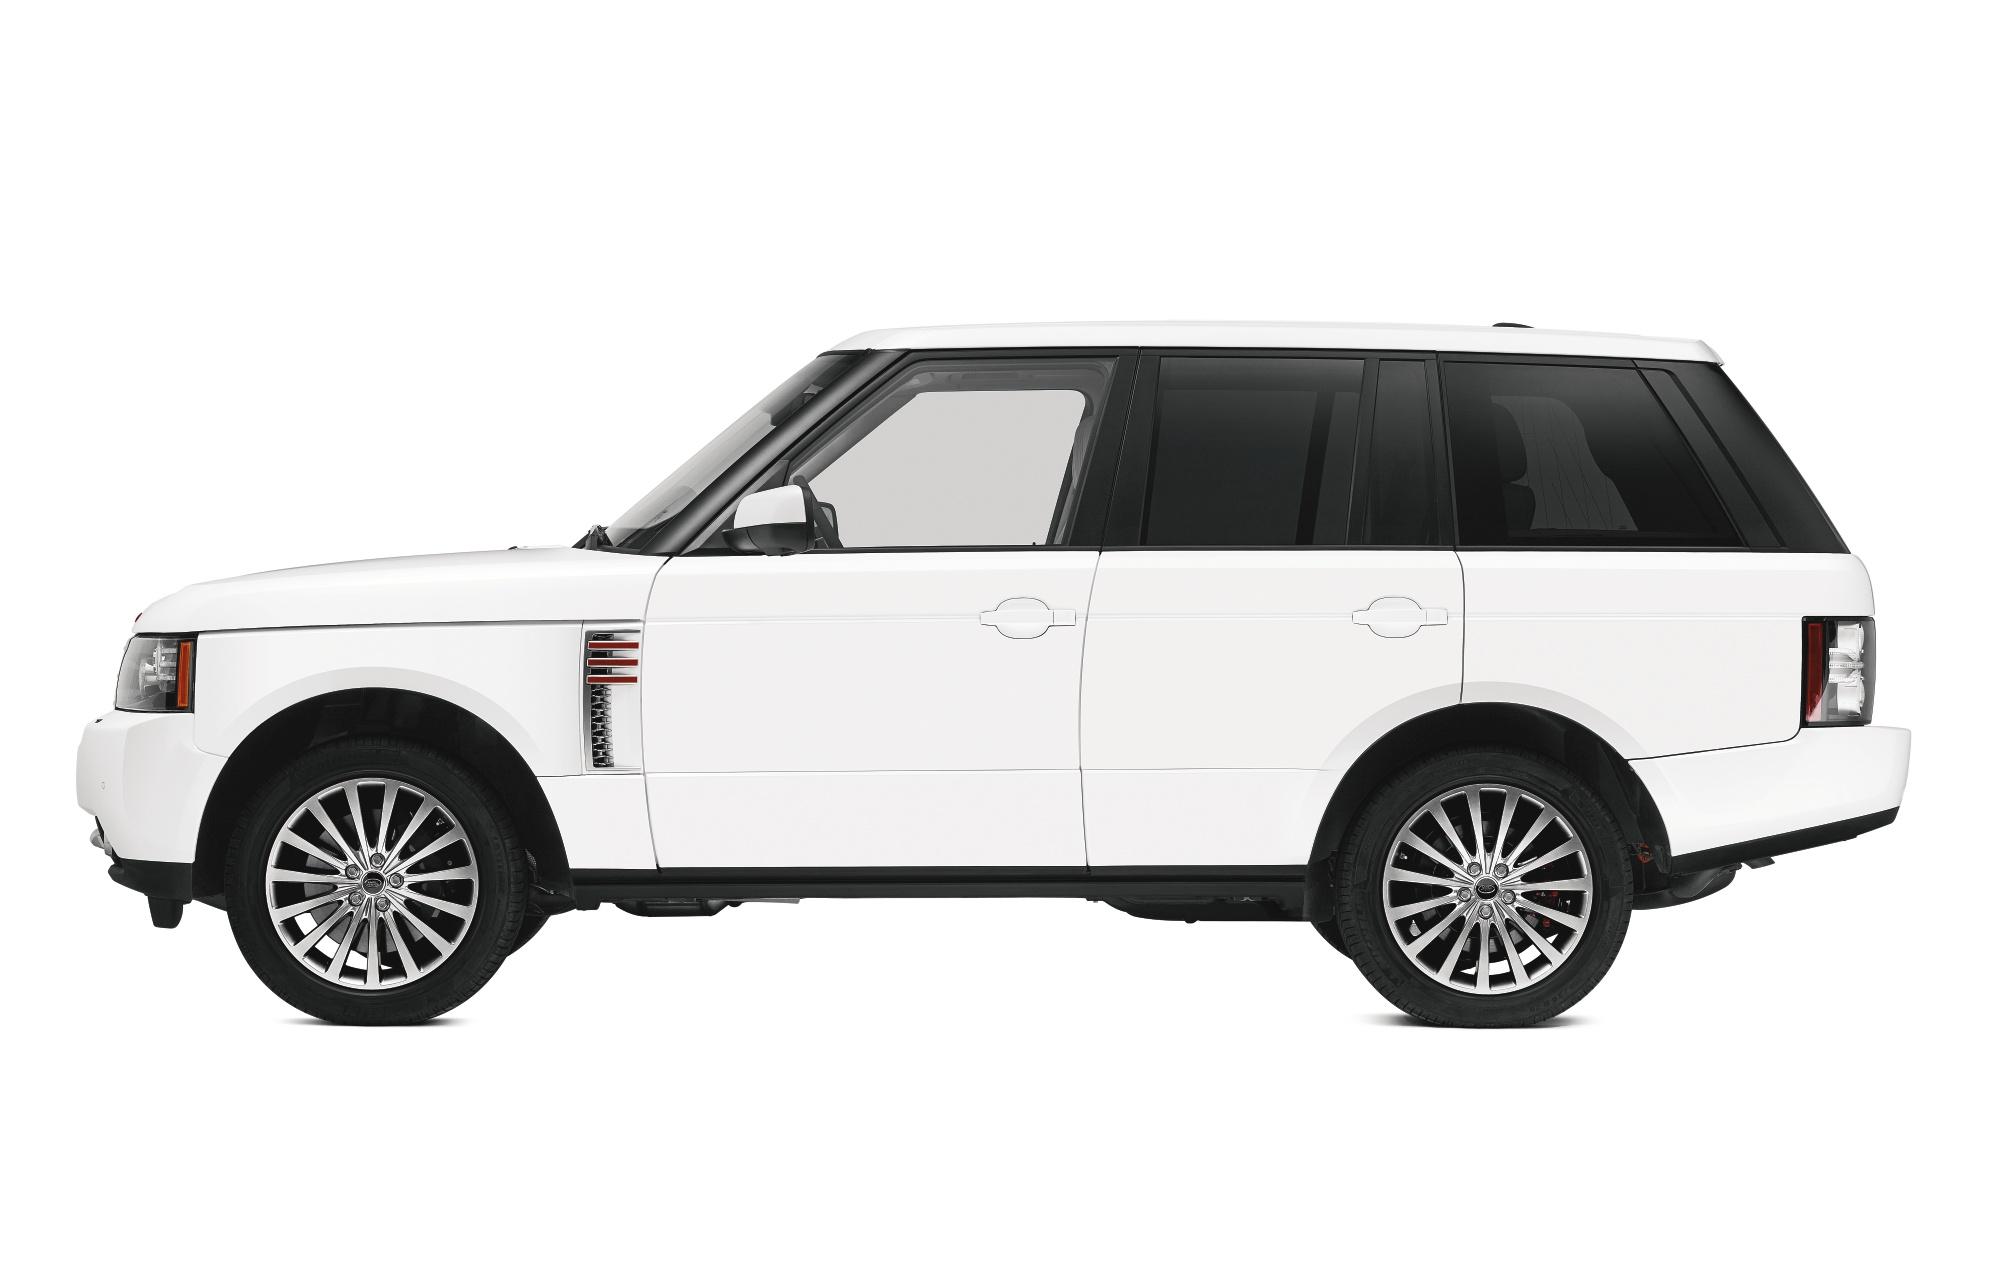 130812RD_range_rover_033_key